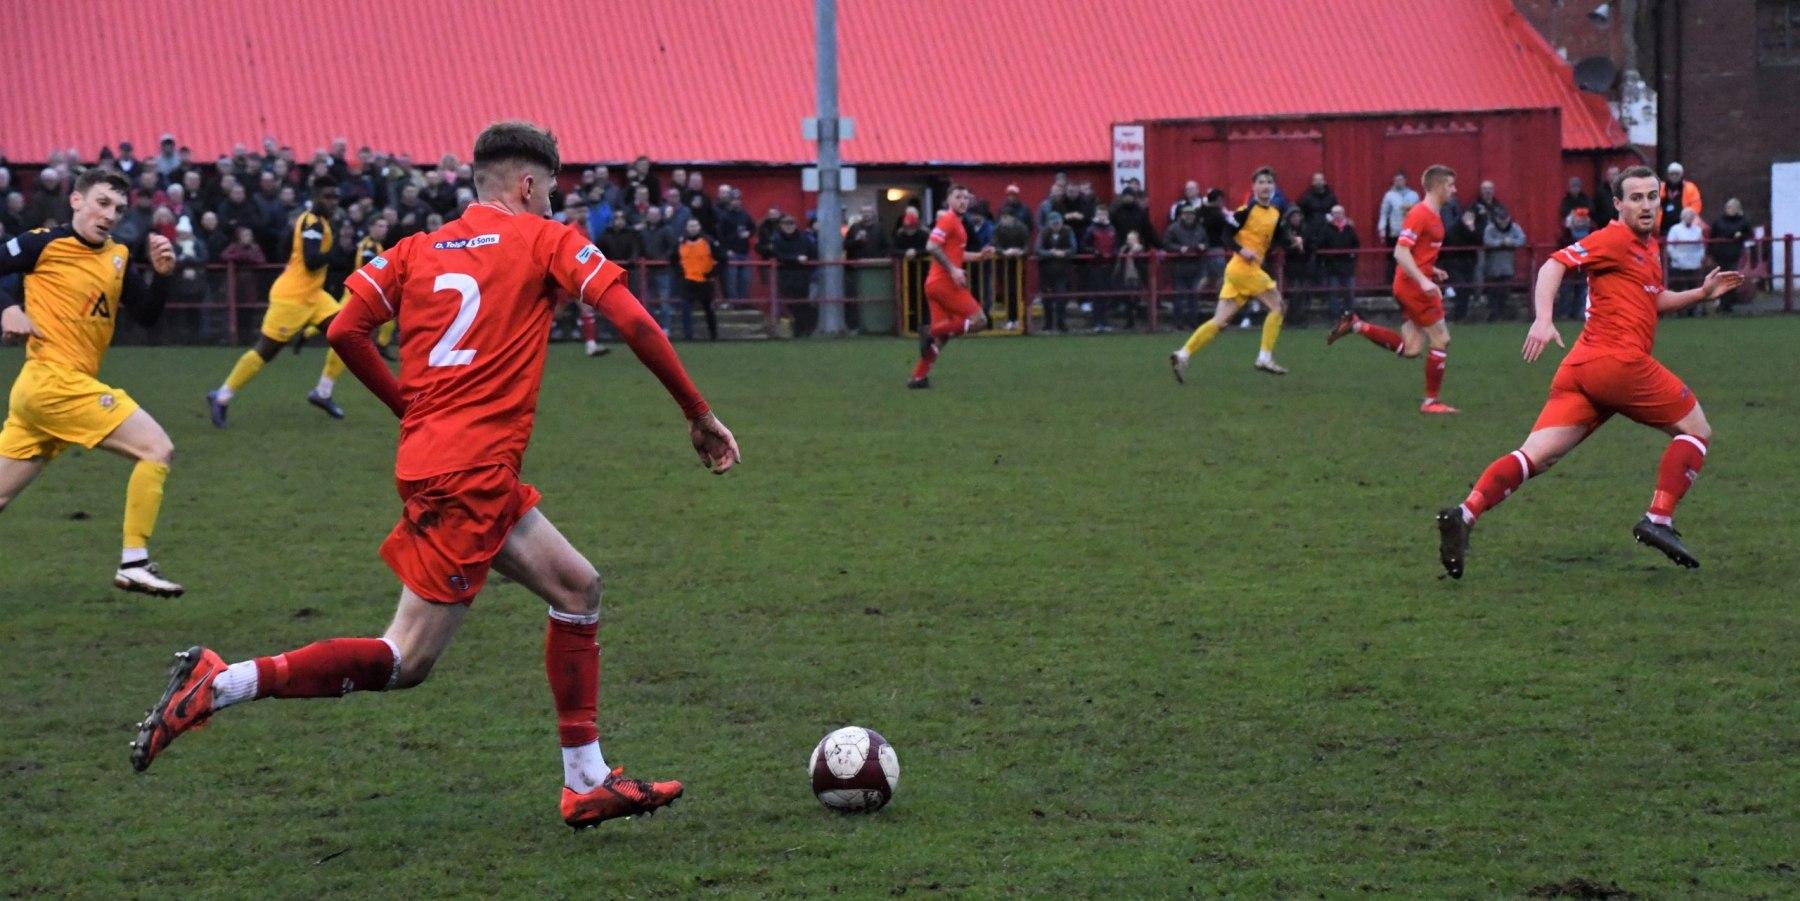 Workington-Reds-v-Trafford-Ben-Challis-15-scaled